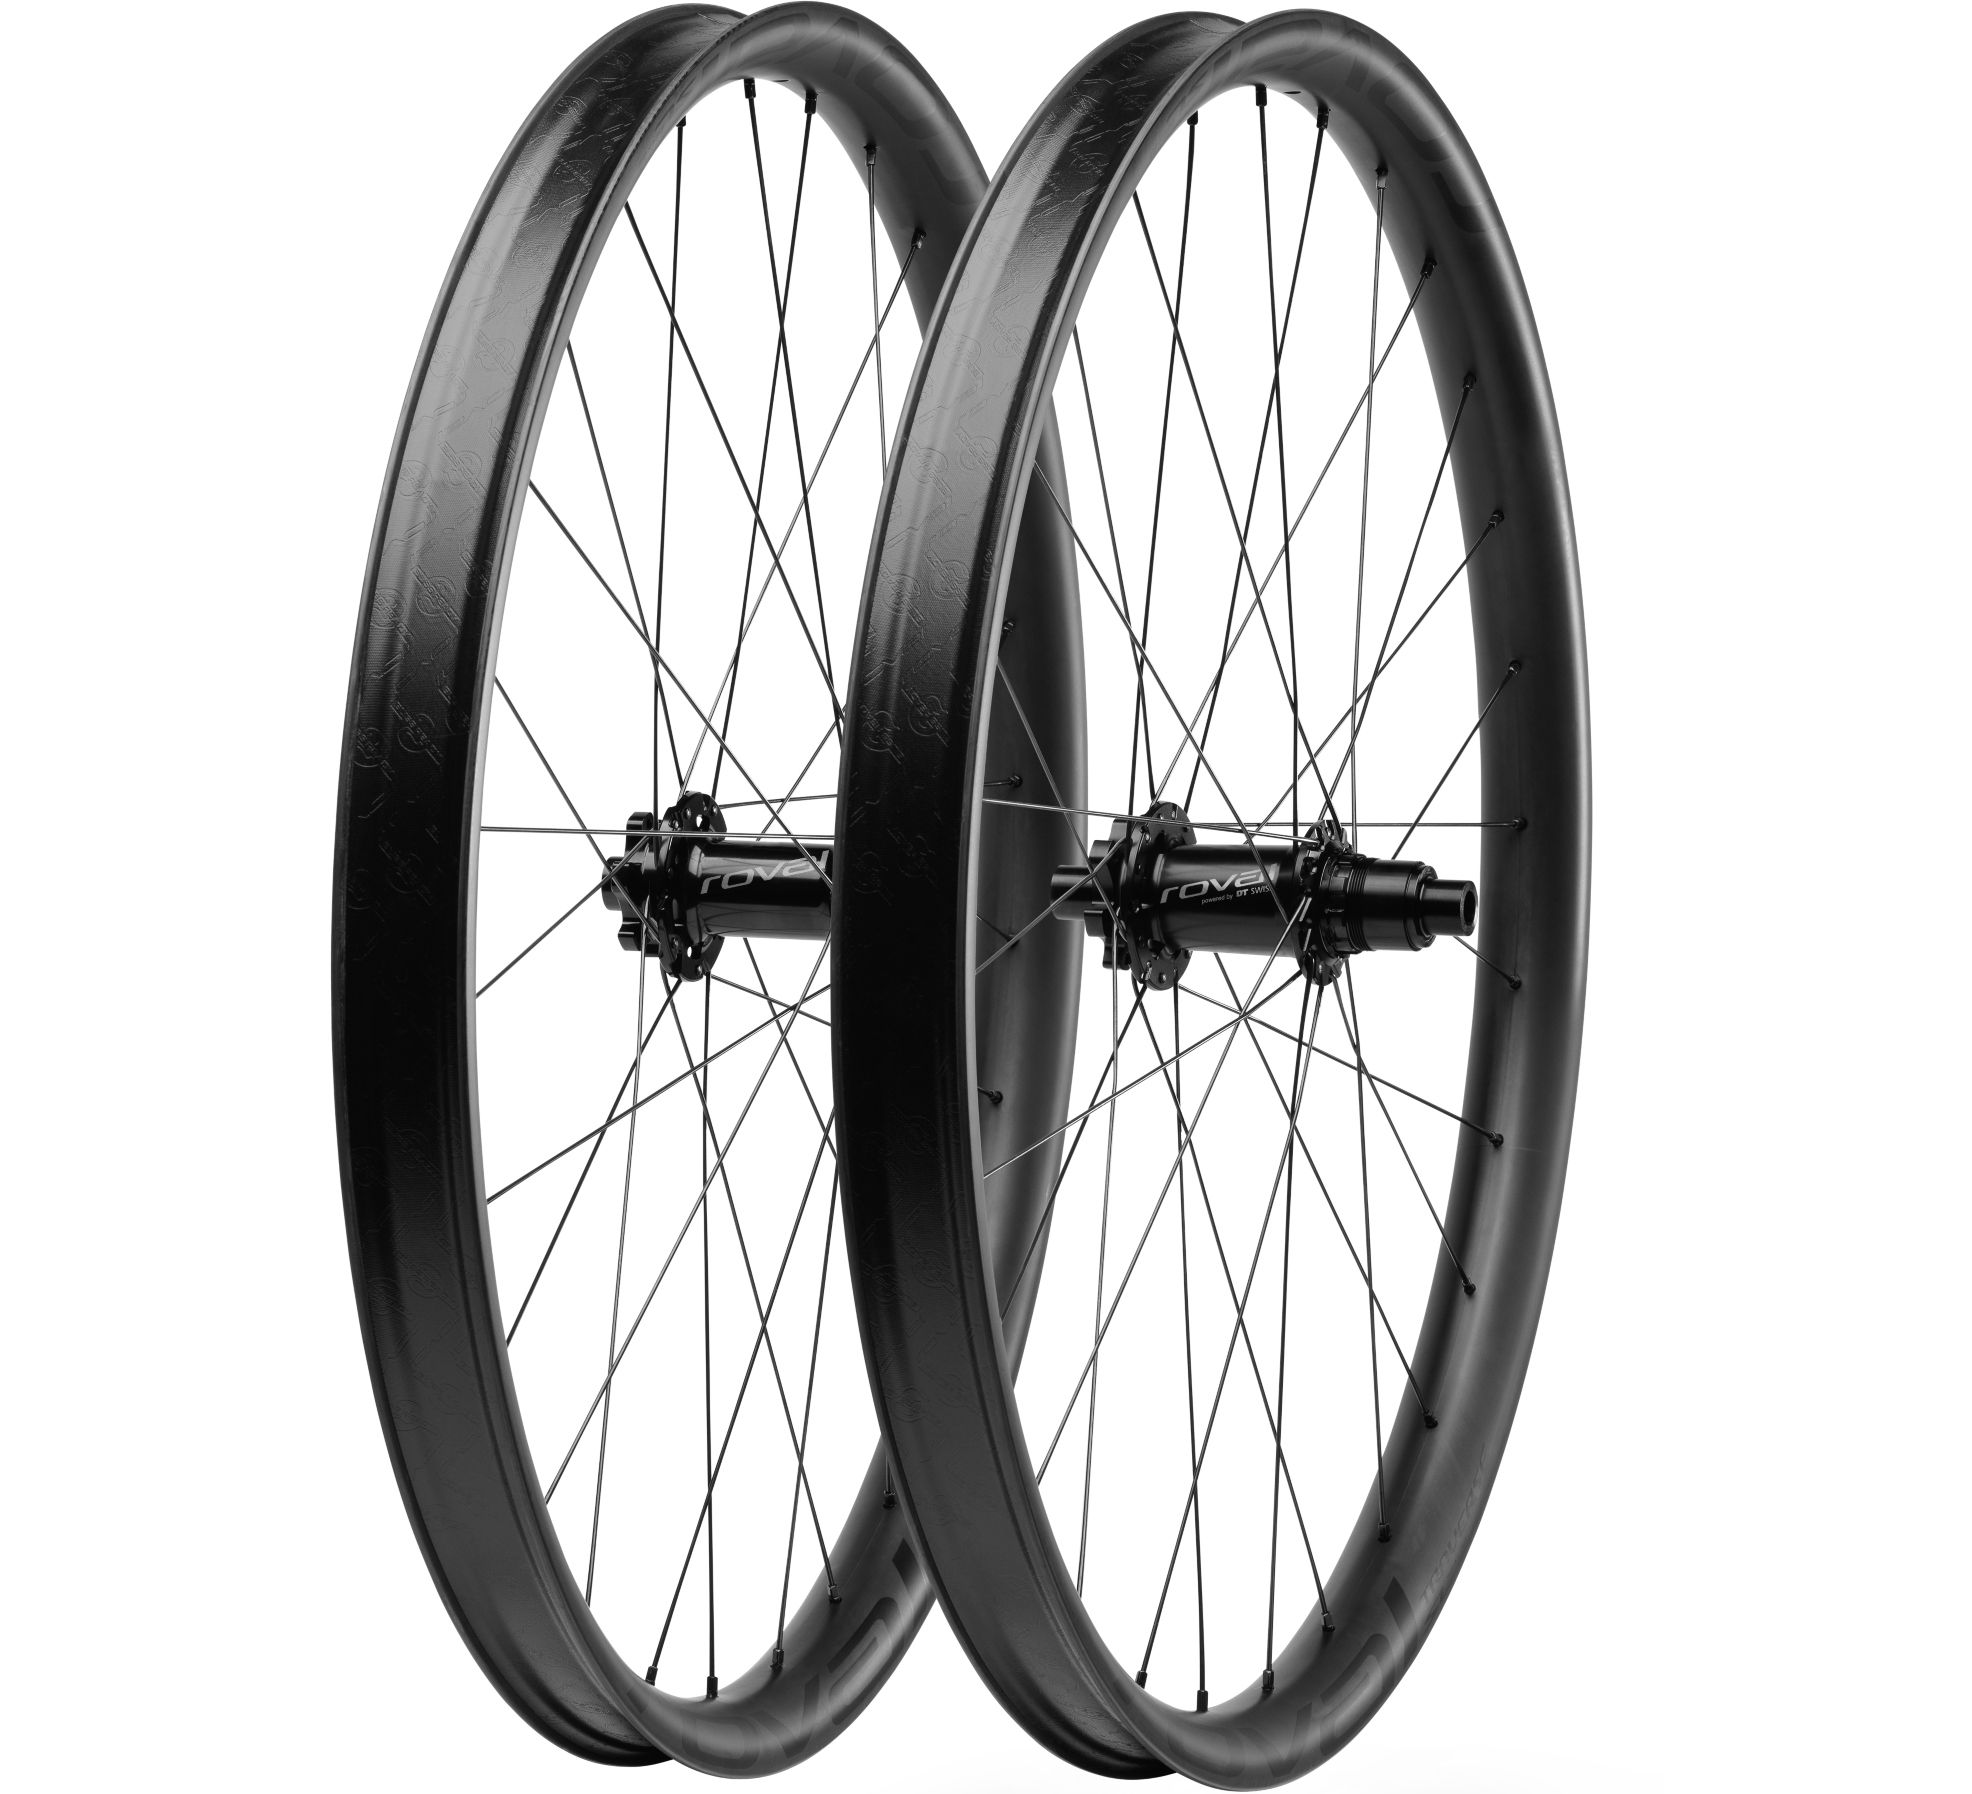 Roval Traverse 38 Sl Fattie 27.5 148 Carbon Mtb Wheelset 2020 | Wheelset